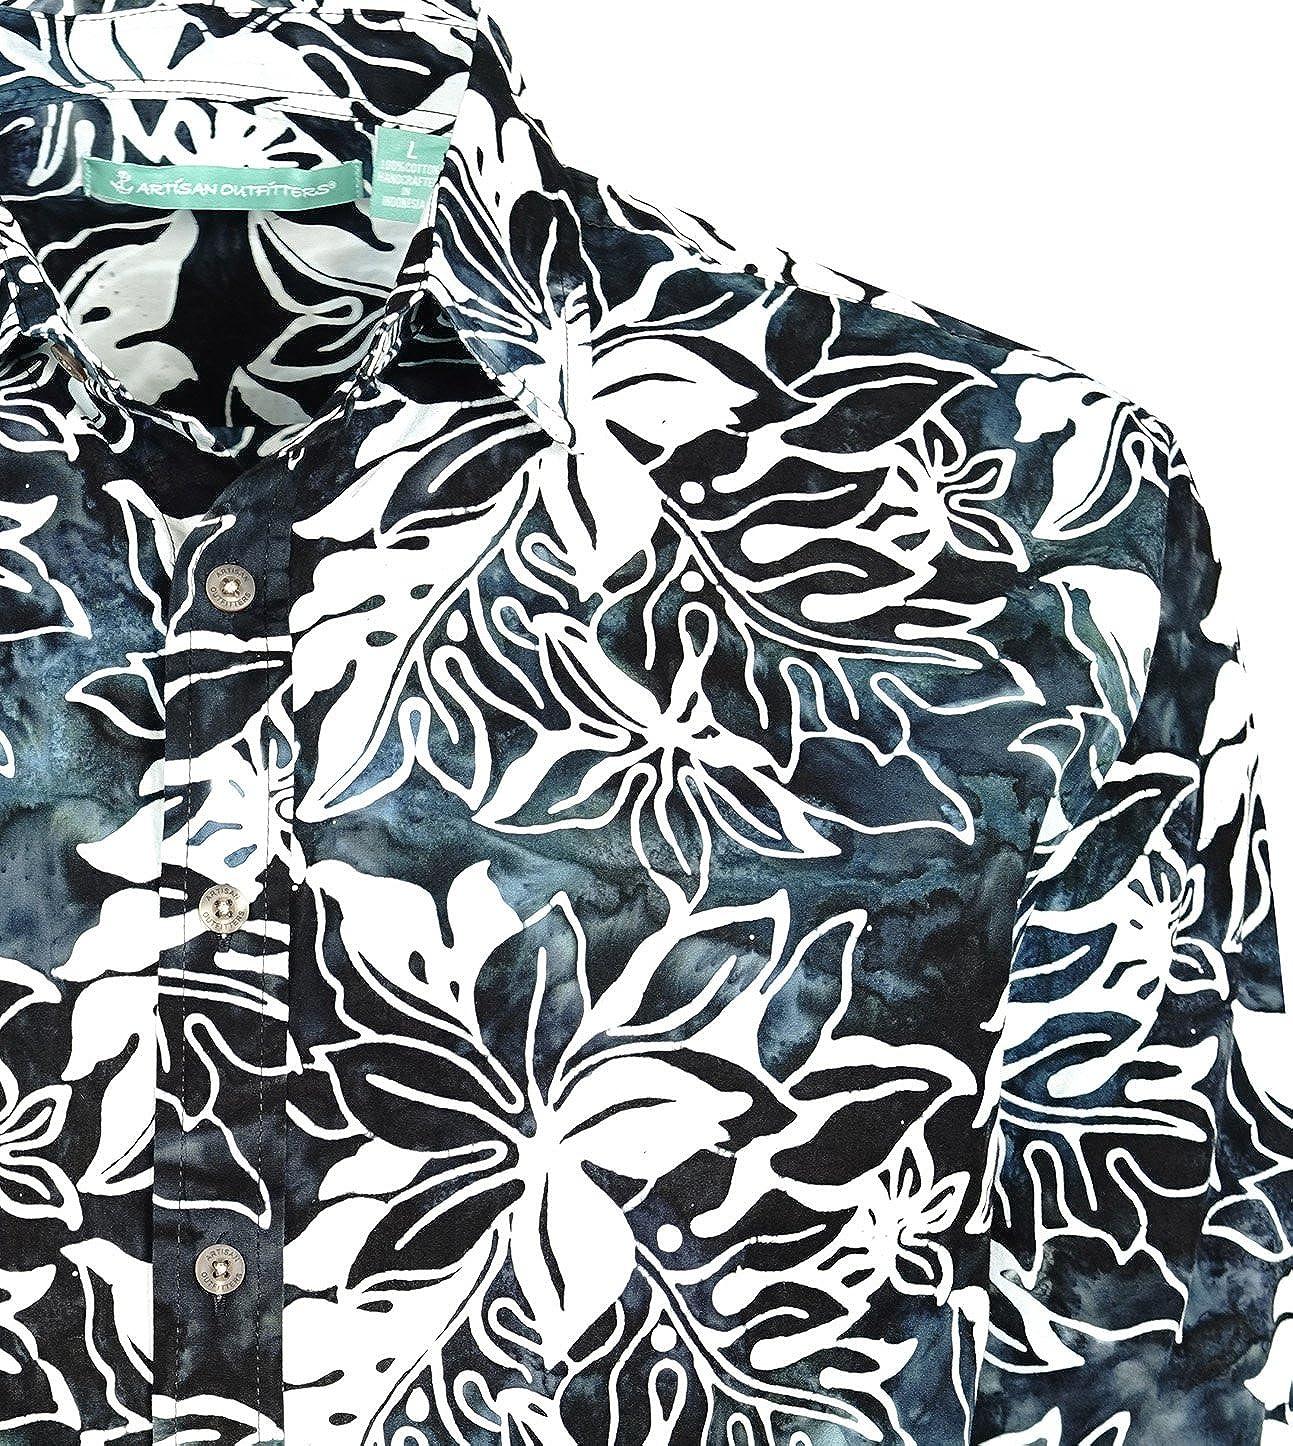 Artisan Outfitters Mens Laguna Batik Cotton Long Sleeve Shirt